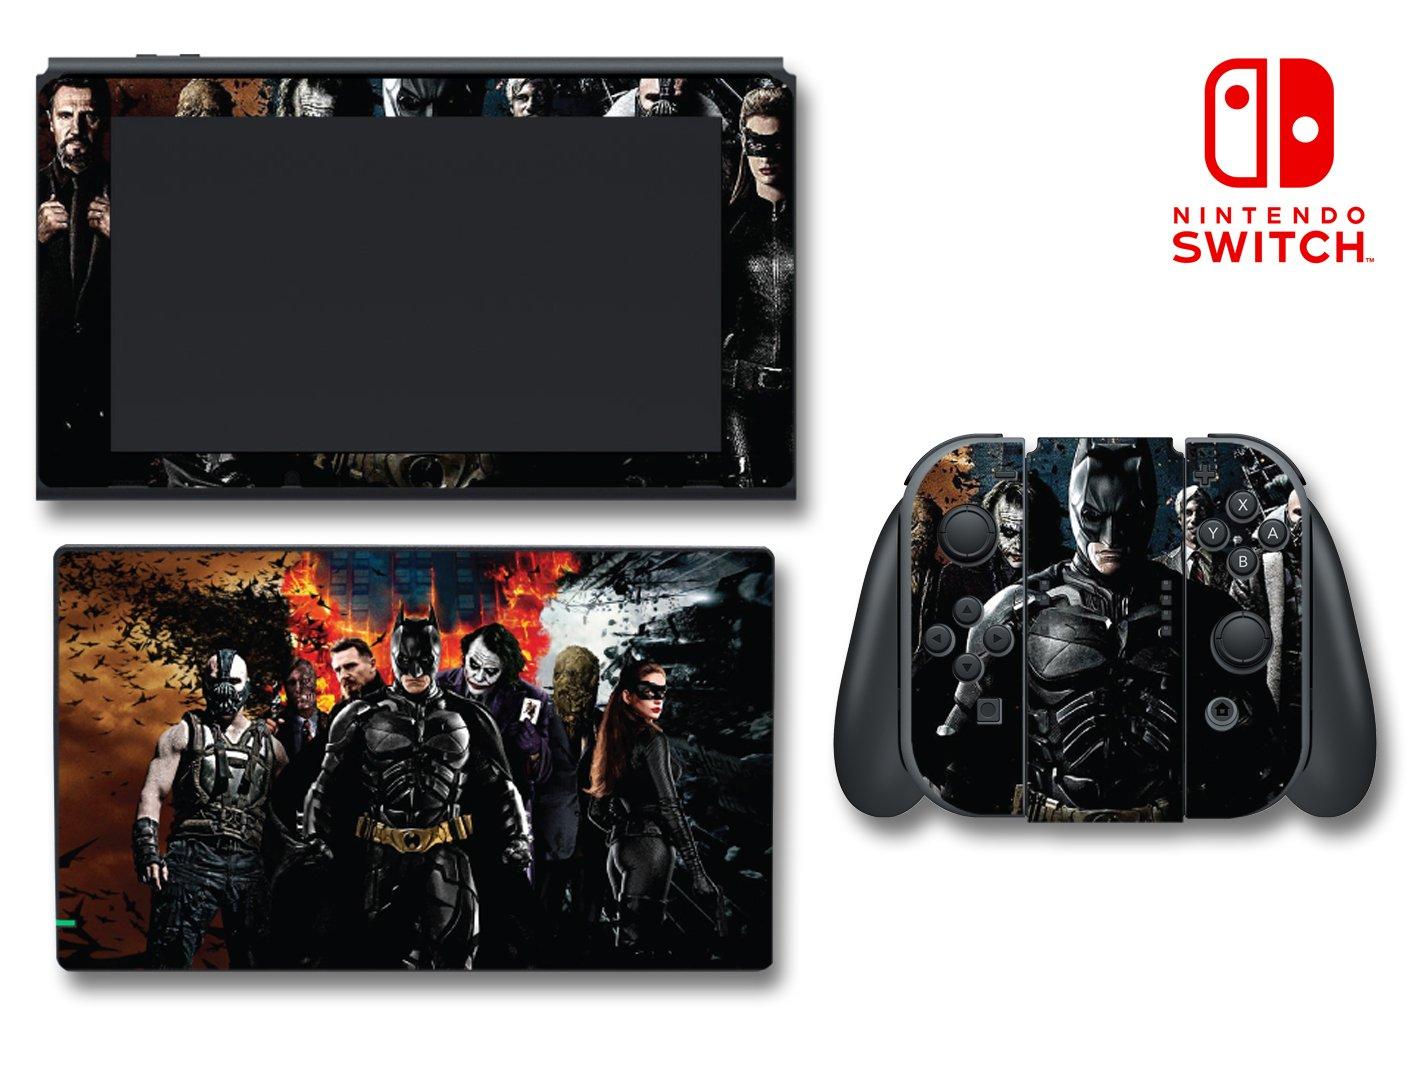 Batman The Dark Knight Rises Joker Cartoon Video Game Vinyl Decal Skin Sticker Cover for Nintendo Switch Console System